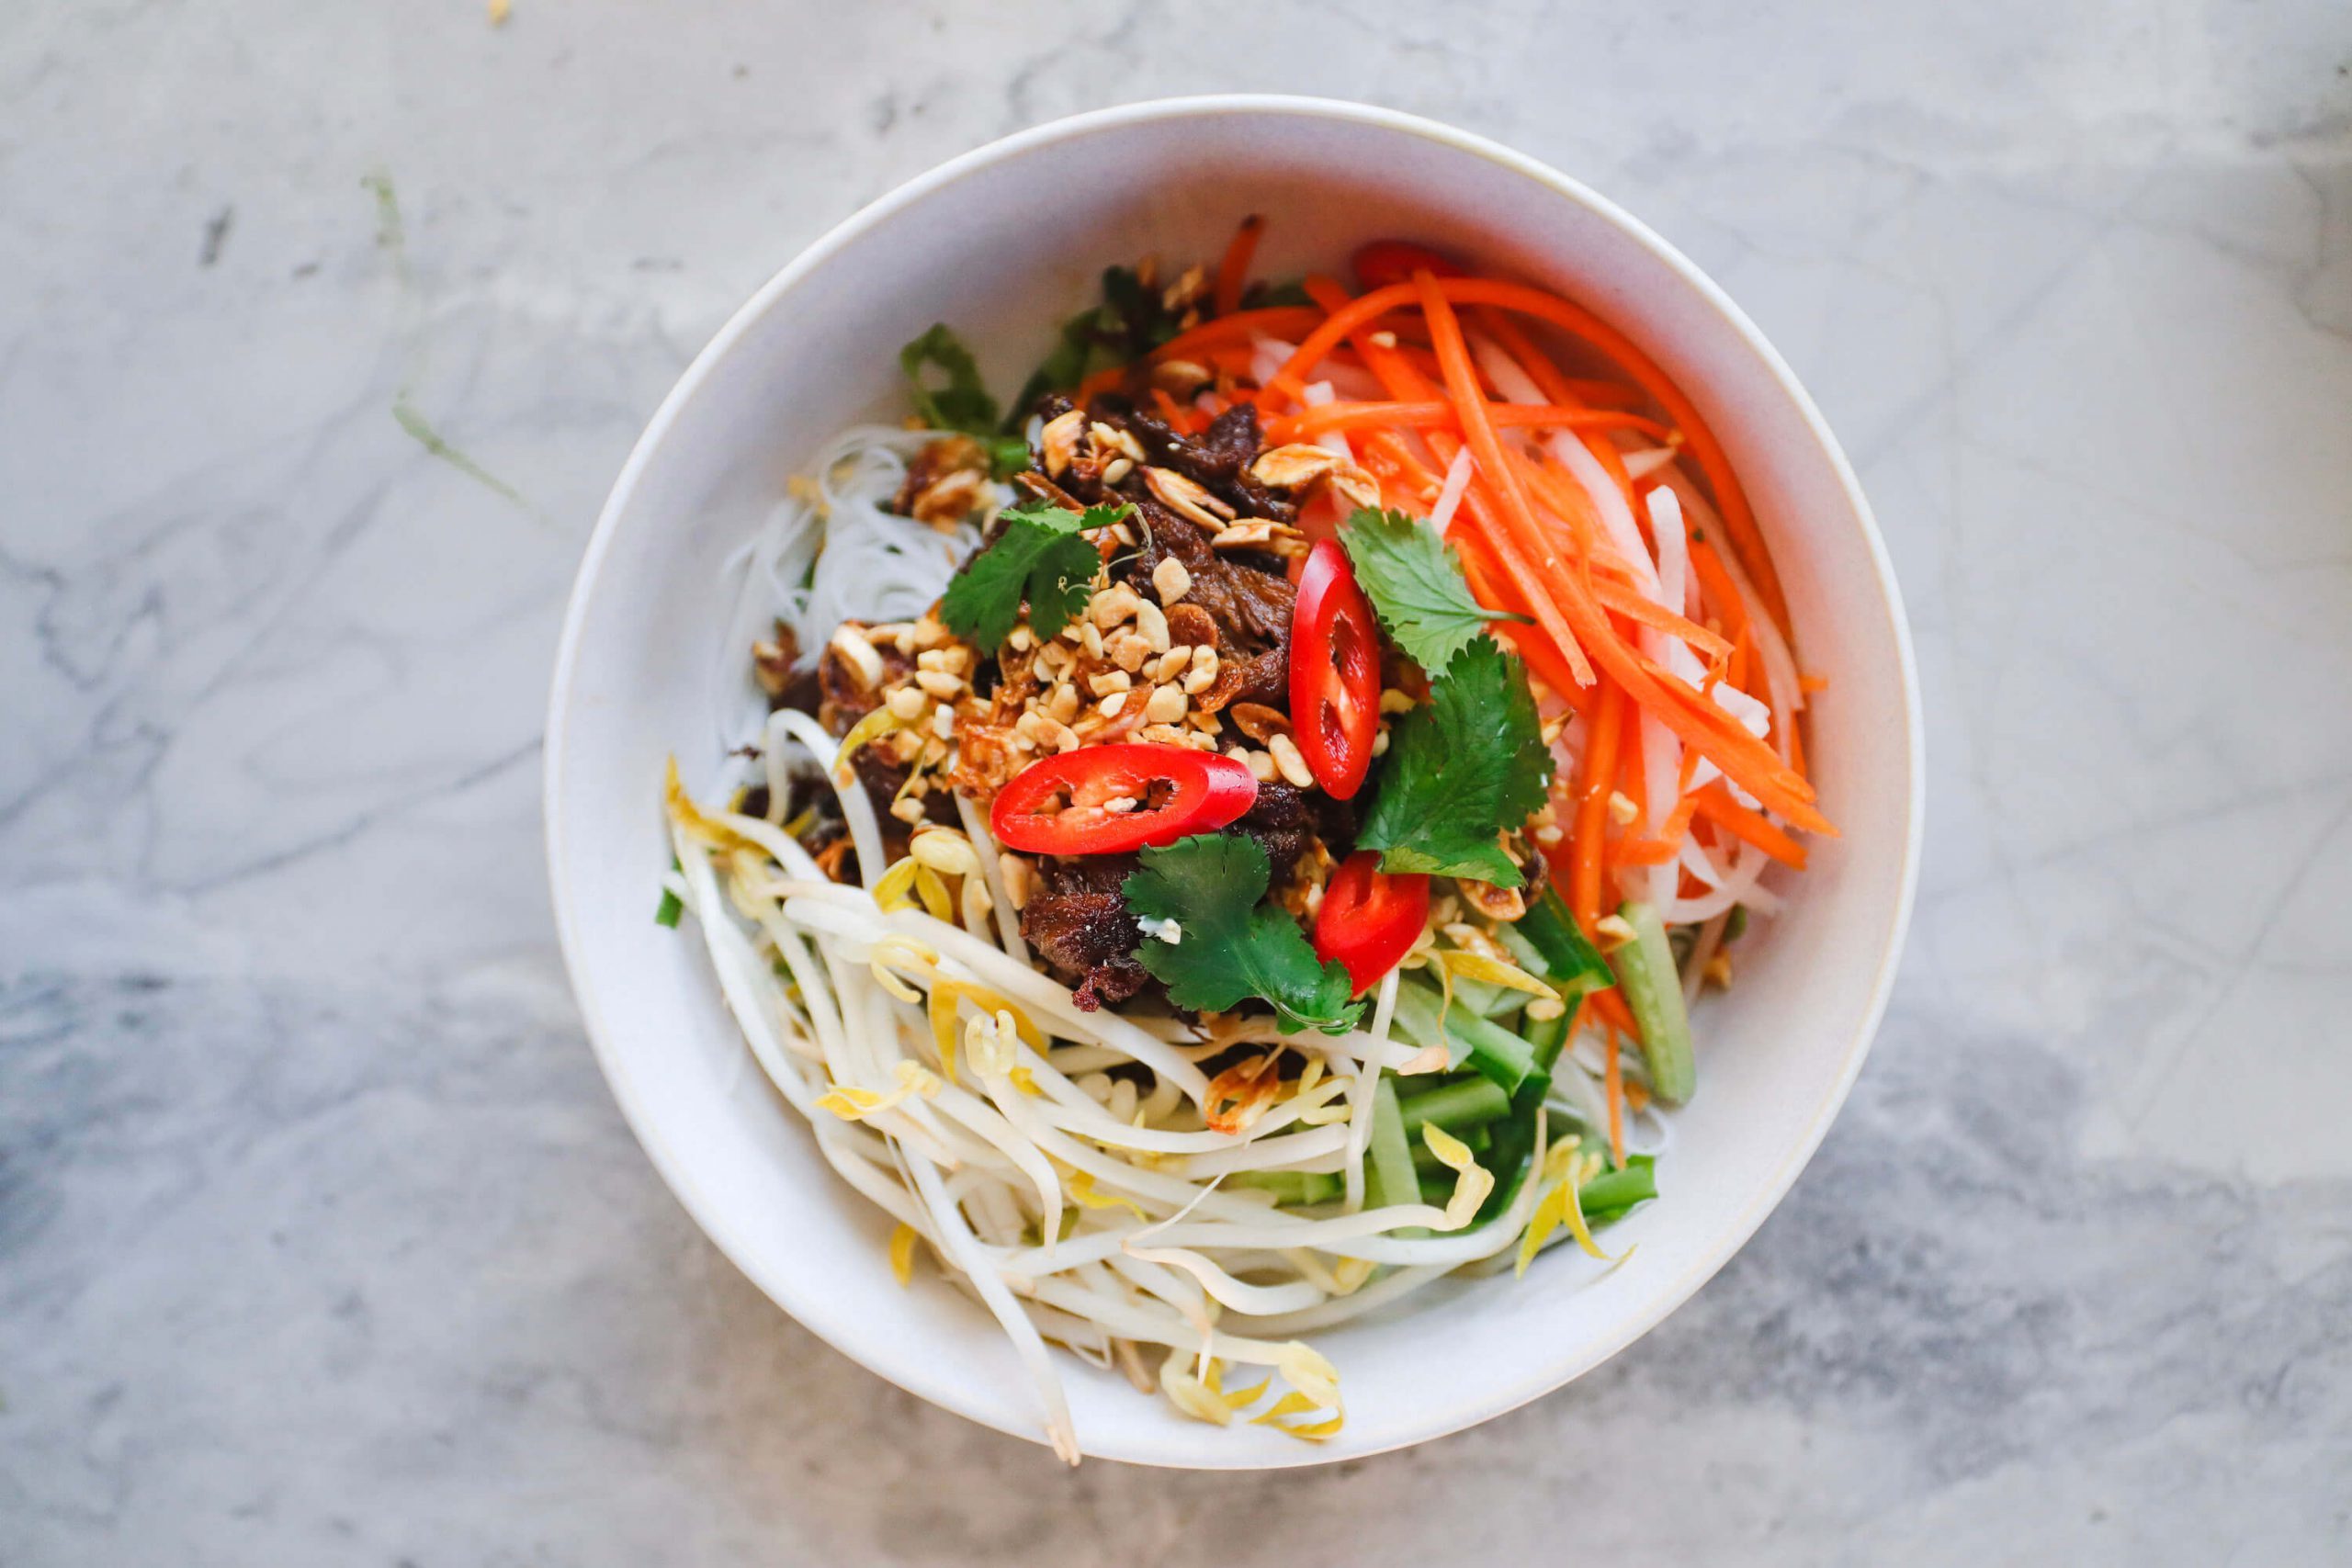 Vietnamese Lemongrass 'Beef' Vermicelli Salad